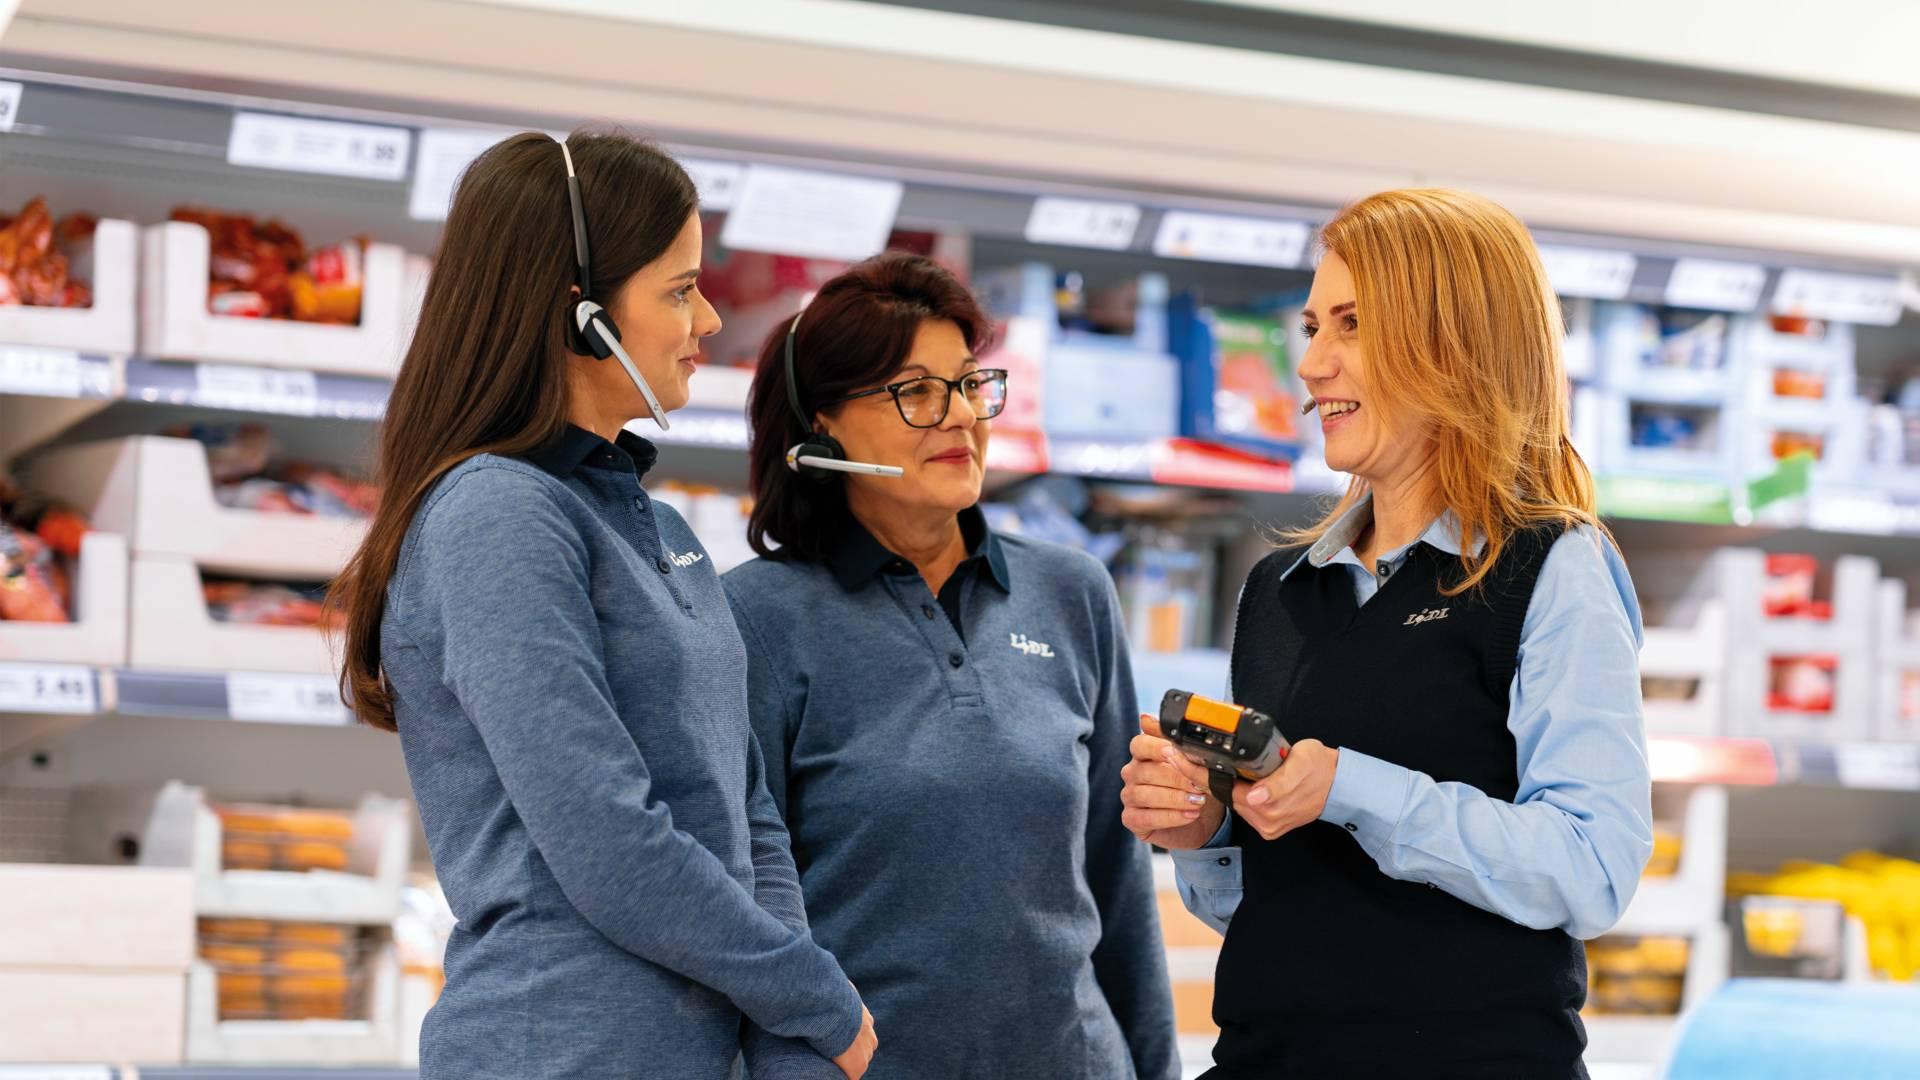 мениджър филиал и двама касиер-продавачи в магазин Лидл